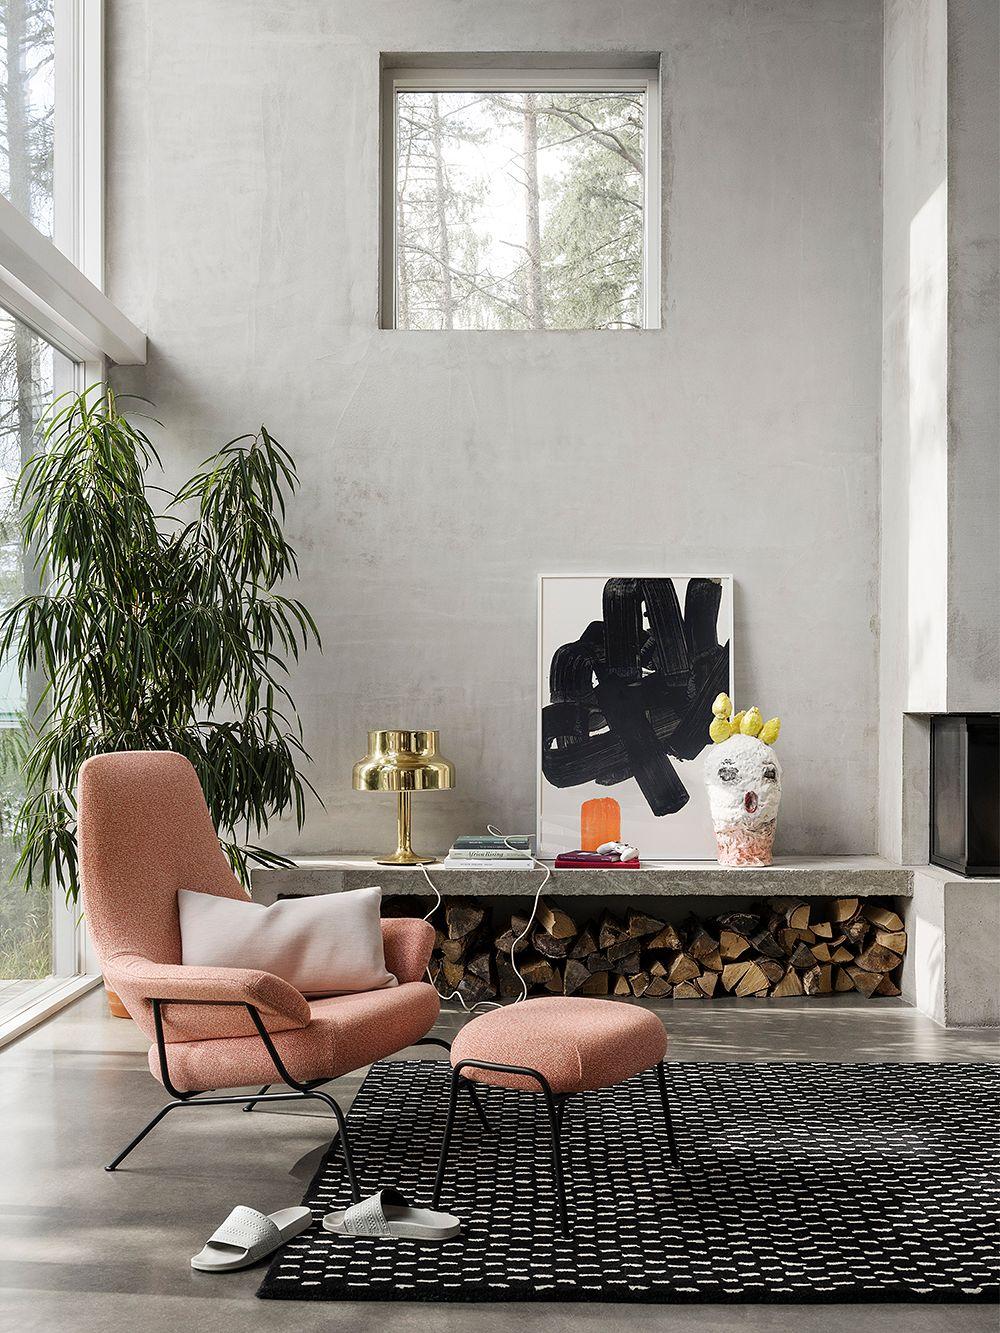 Hem's Hai lounge chair and Hai ottoman in living room decor.